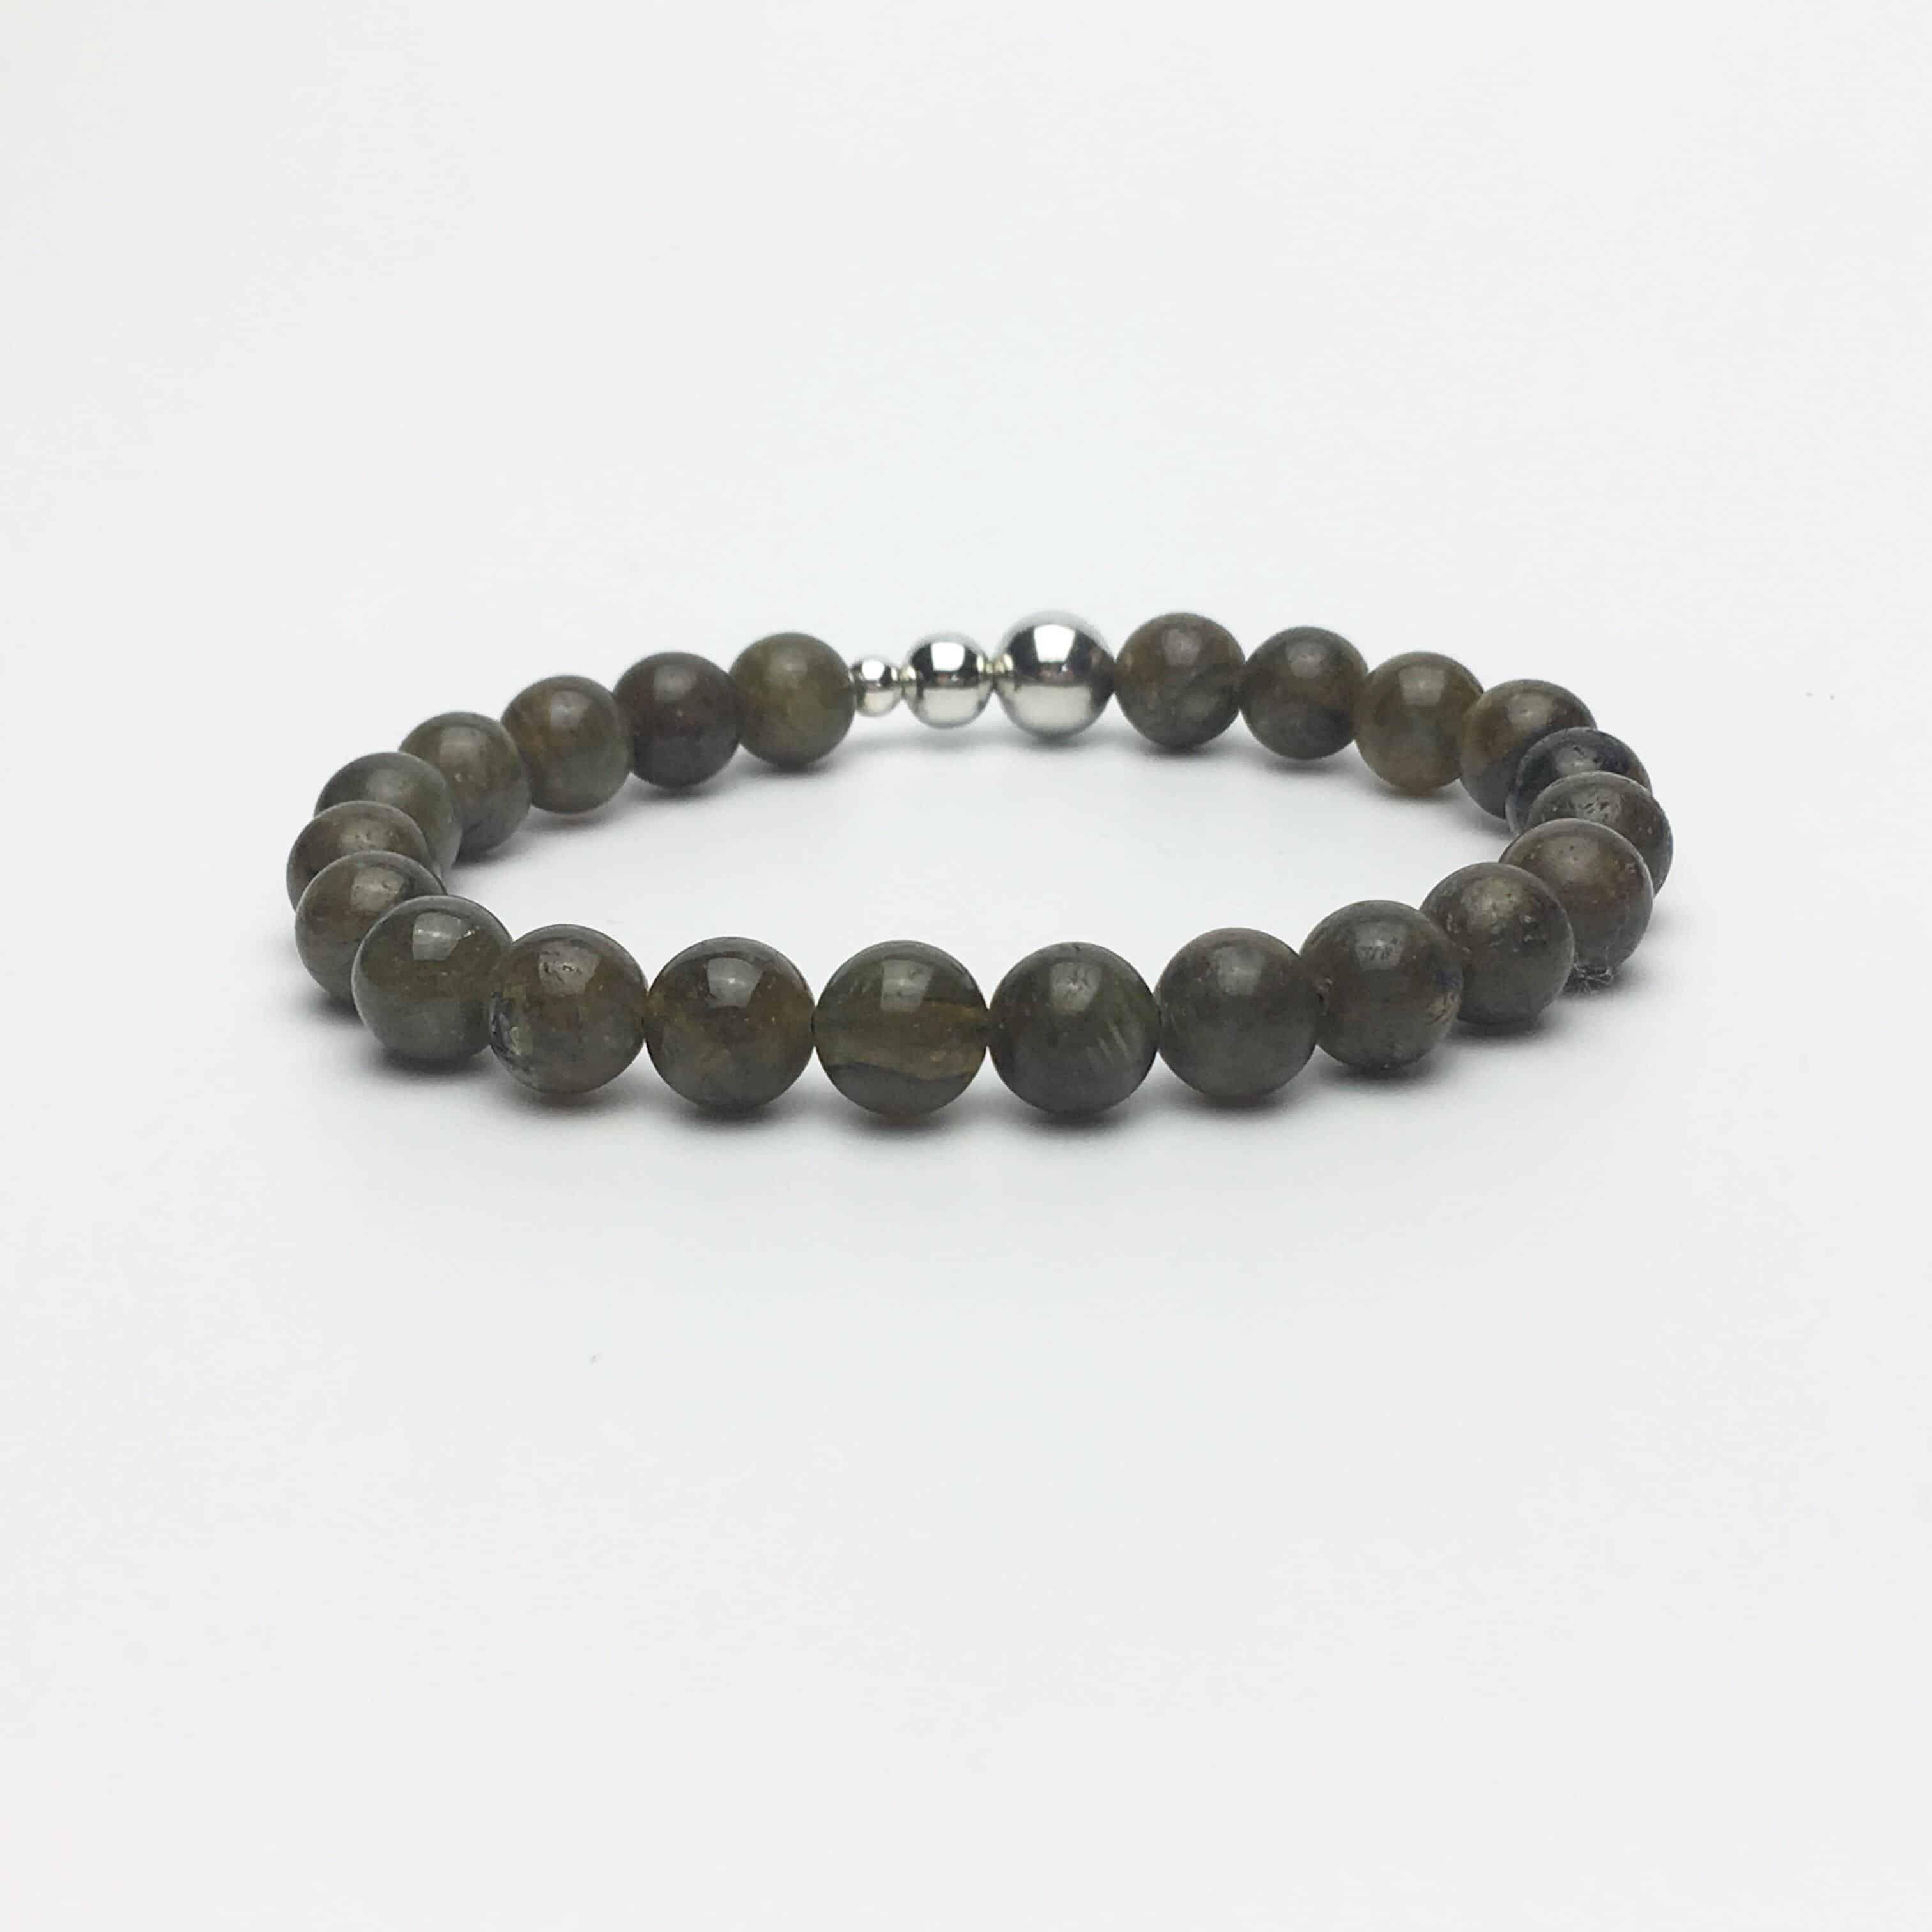 Labradorite and Sterling Silver Bead Bracelet